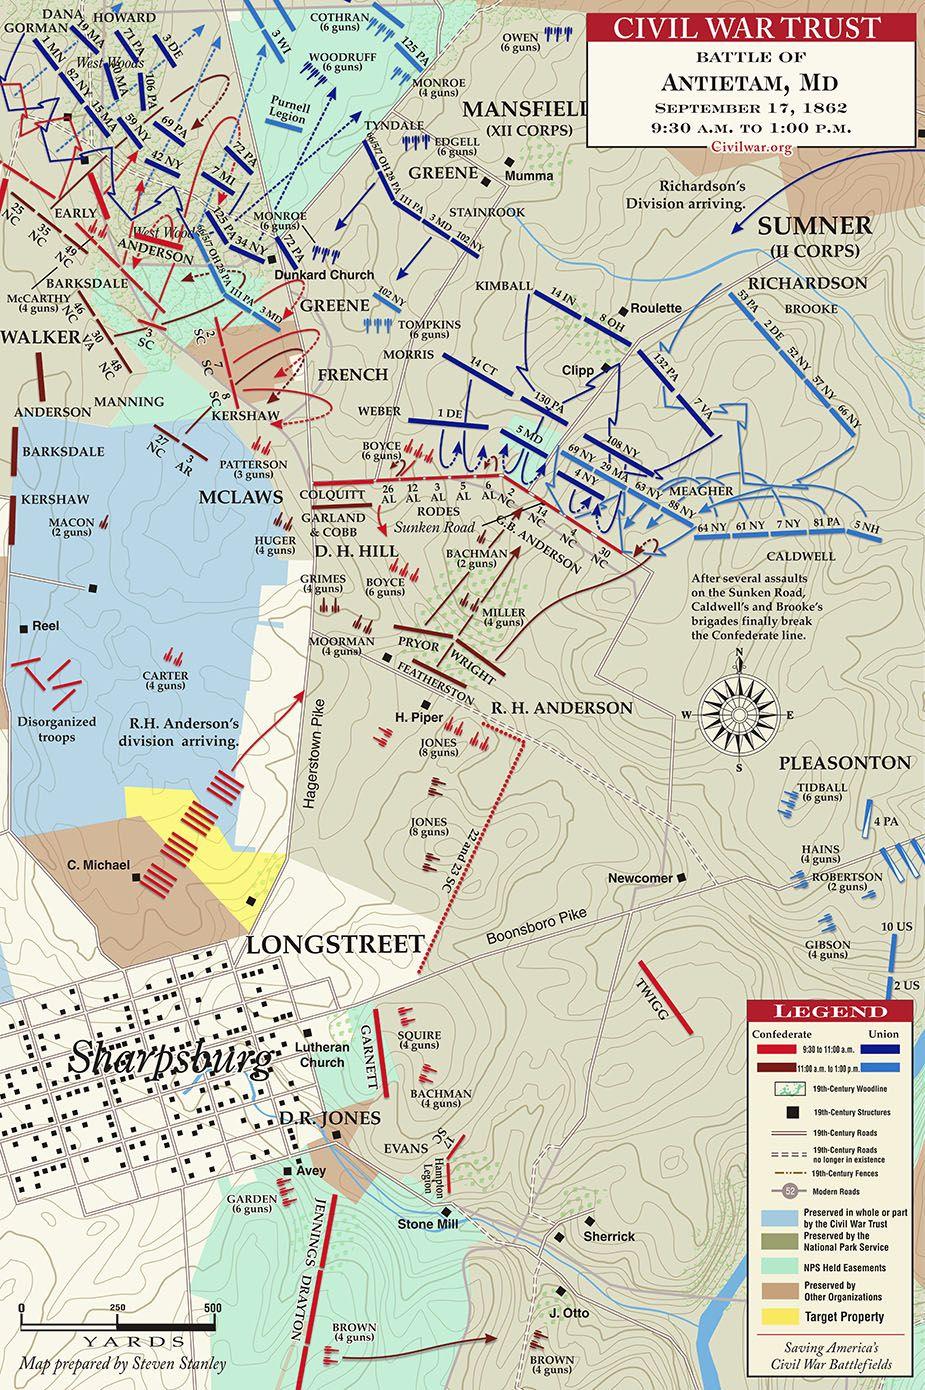 idees maison map of antietam battlefield